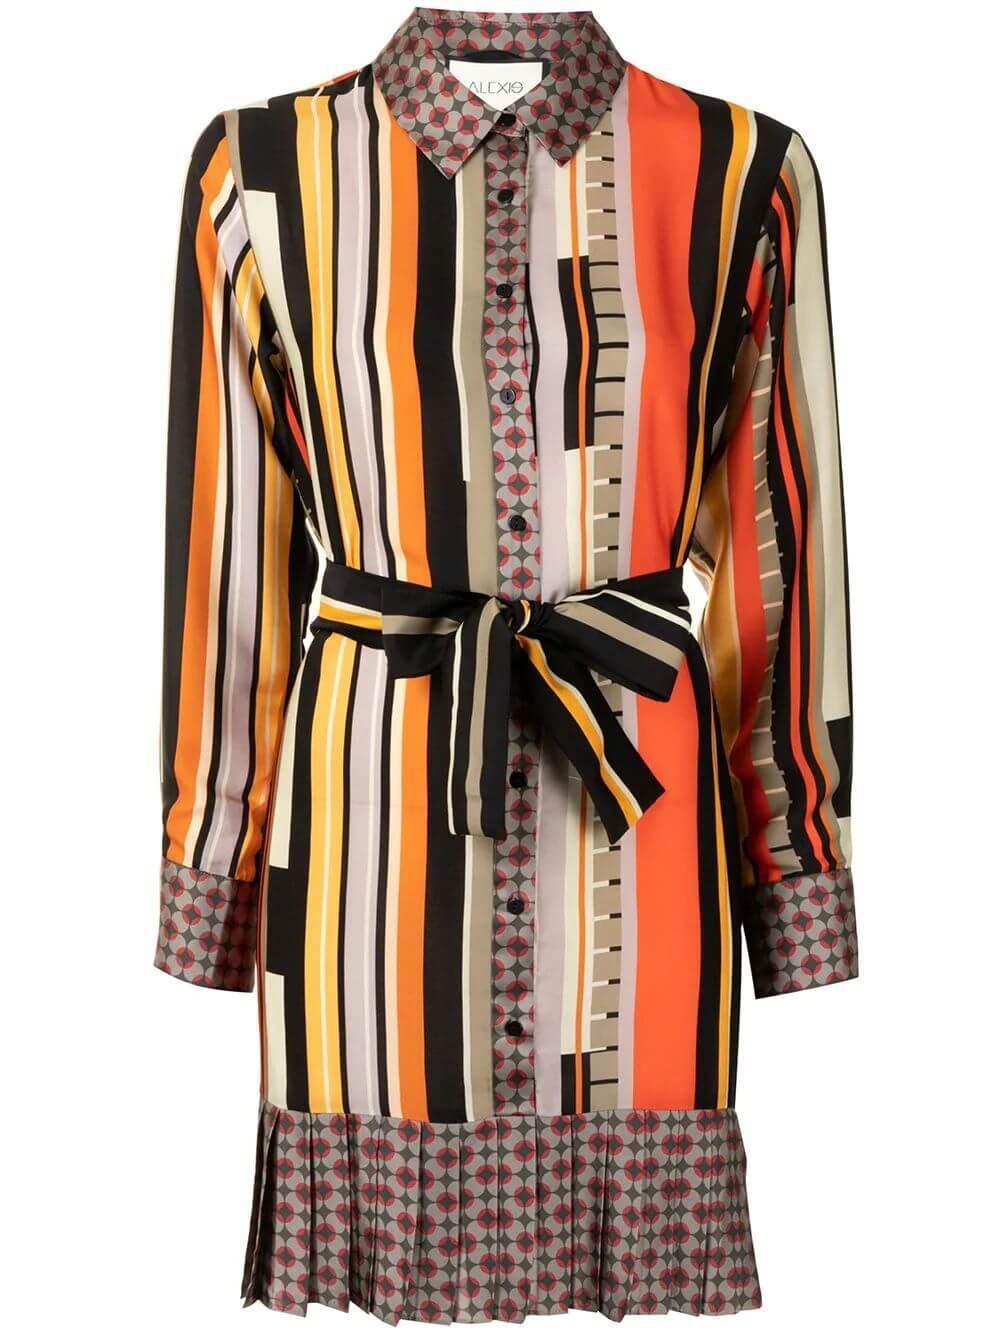 Payton Striped Dress Item # PAYTON-F20